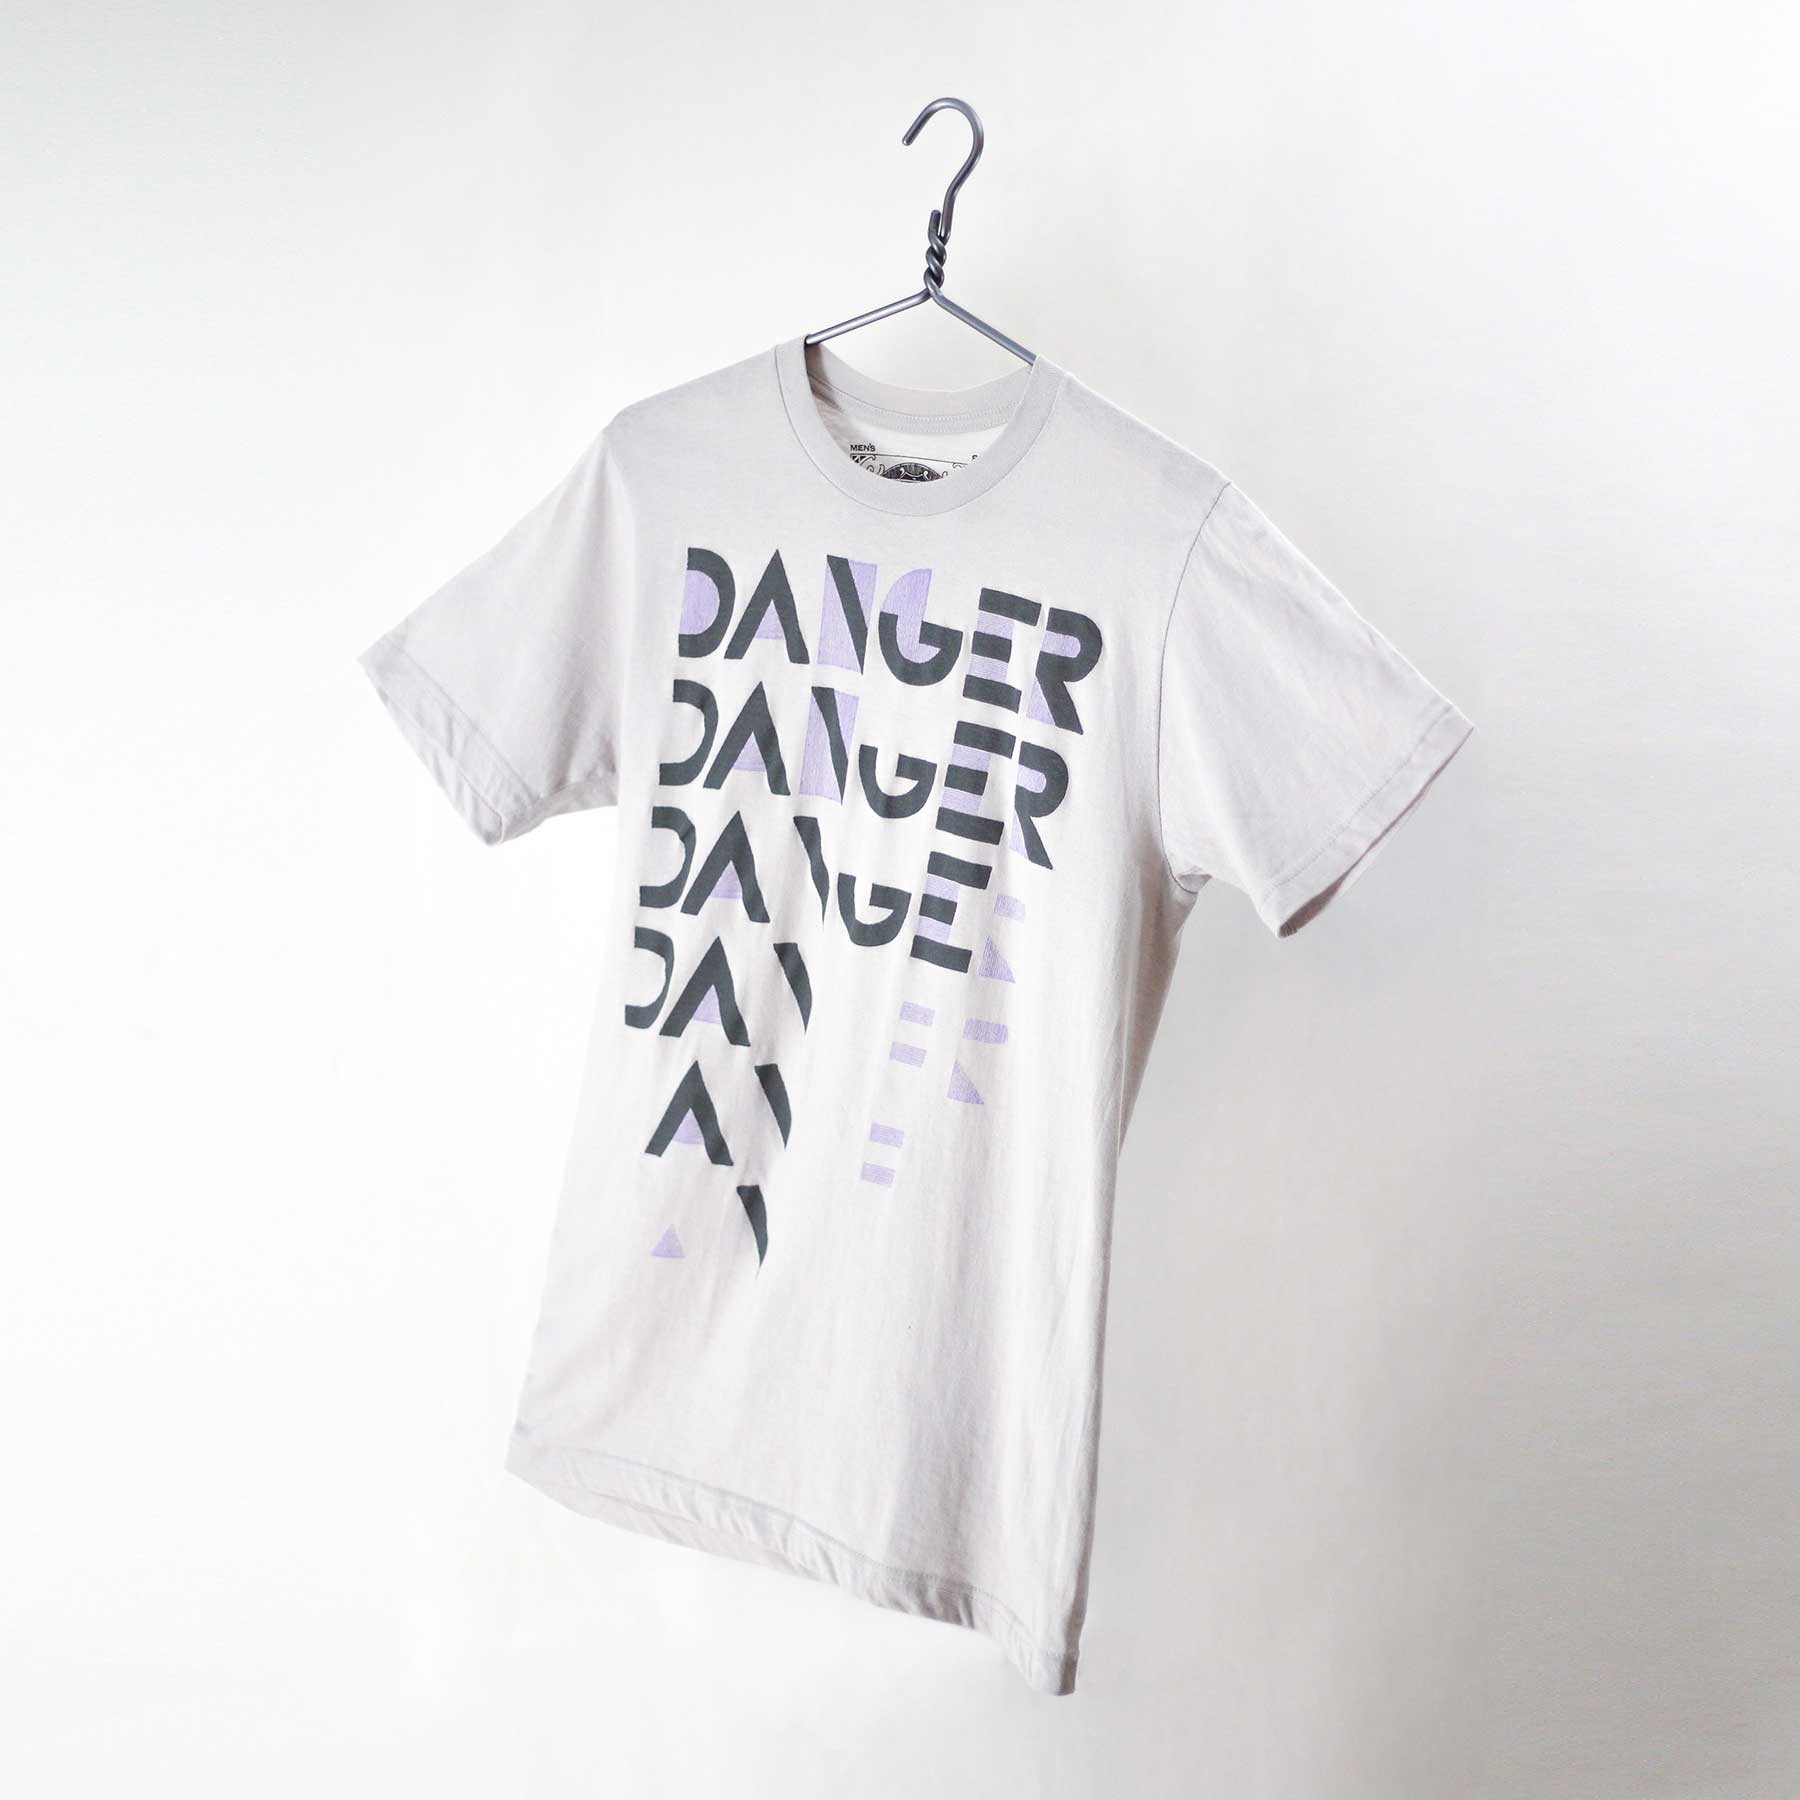 T Shirt Printing In Buckhead Atlanta